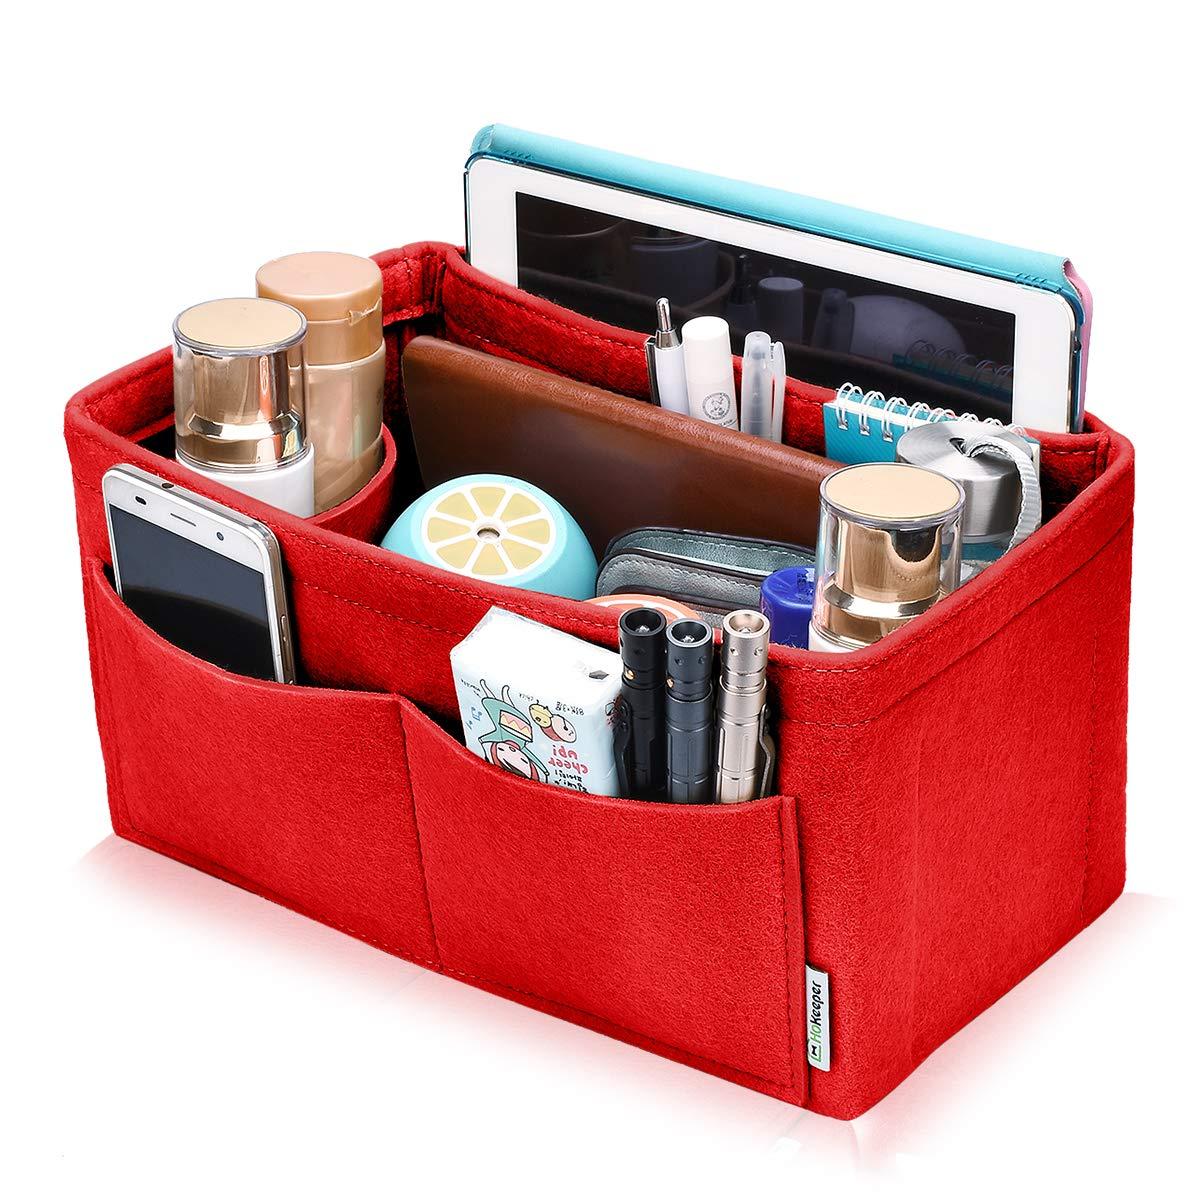 Felt Insert Bag Organizer Bag In Bag For Handbag Purse Tote Diaper Bag, Fits Speedy Neverfull, 4 Sizes, 6 Colors